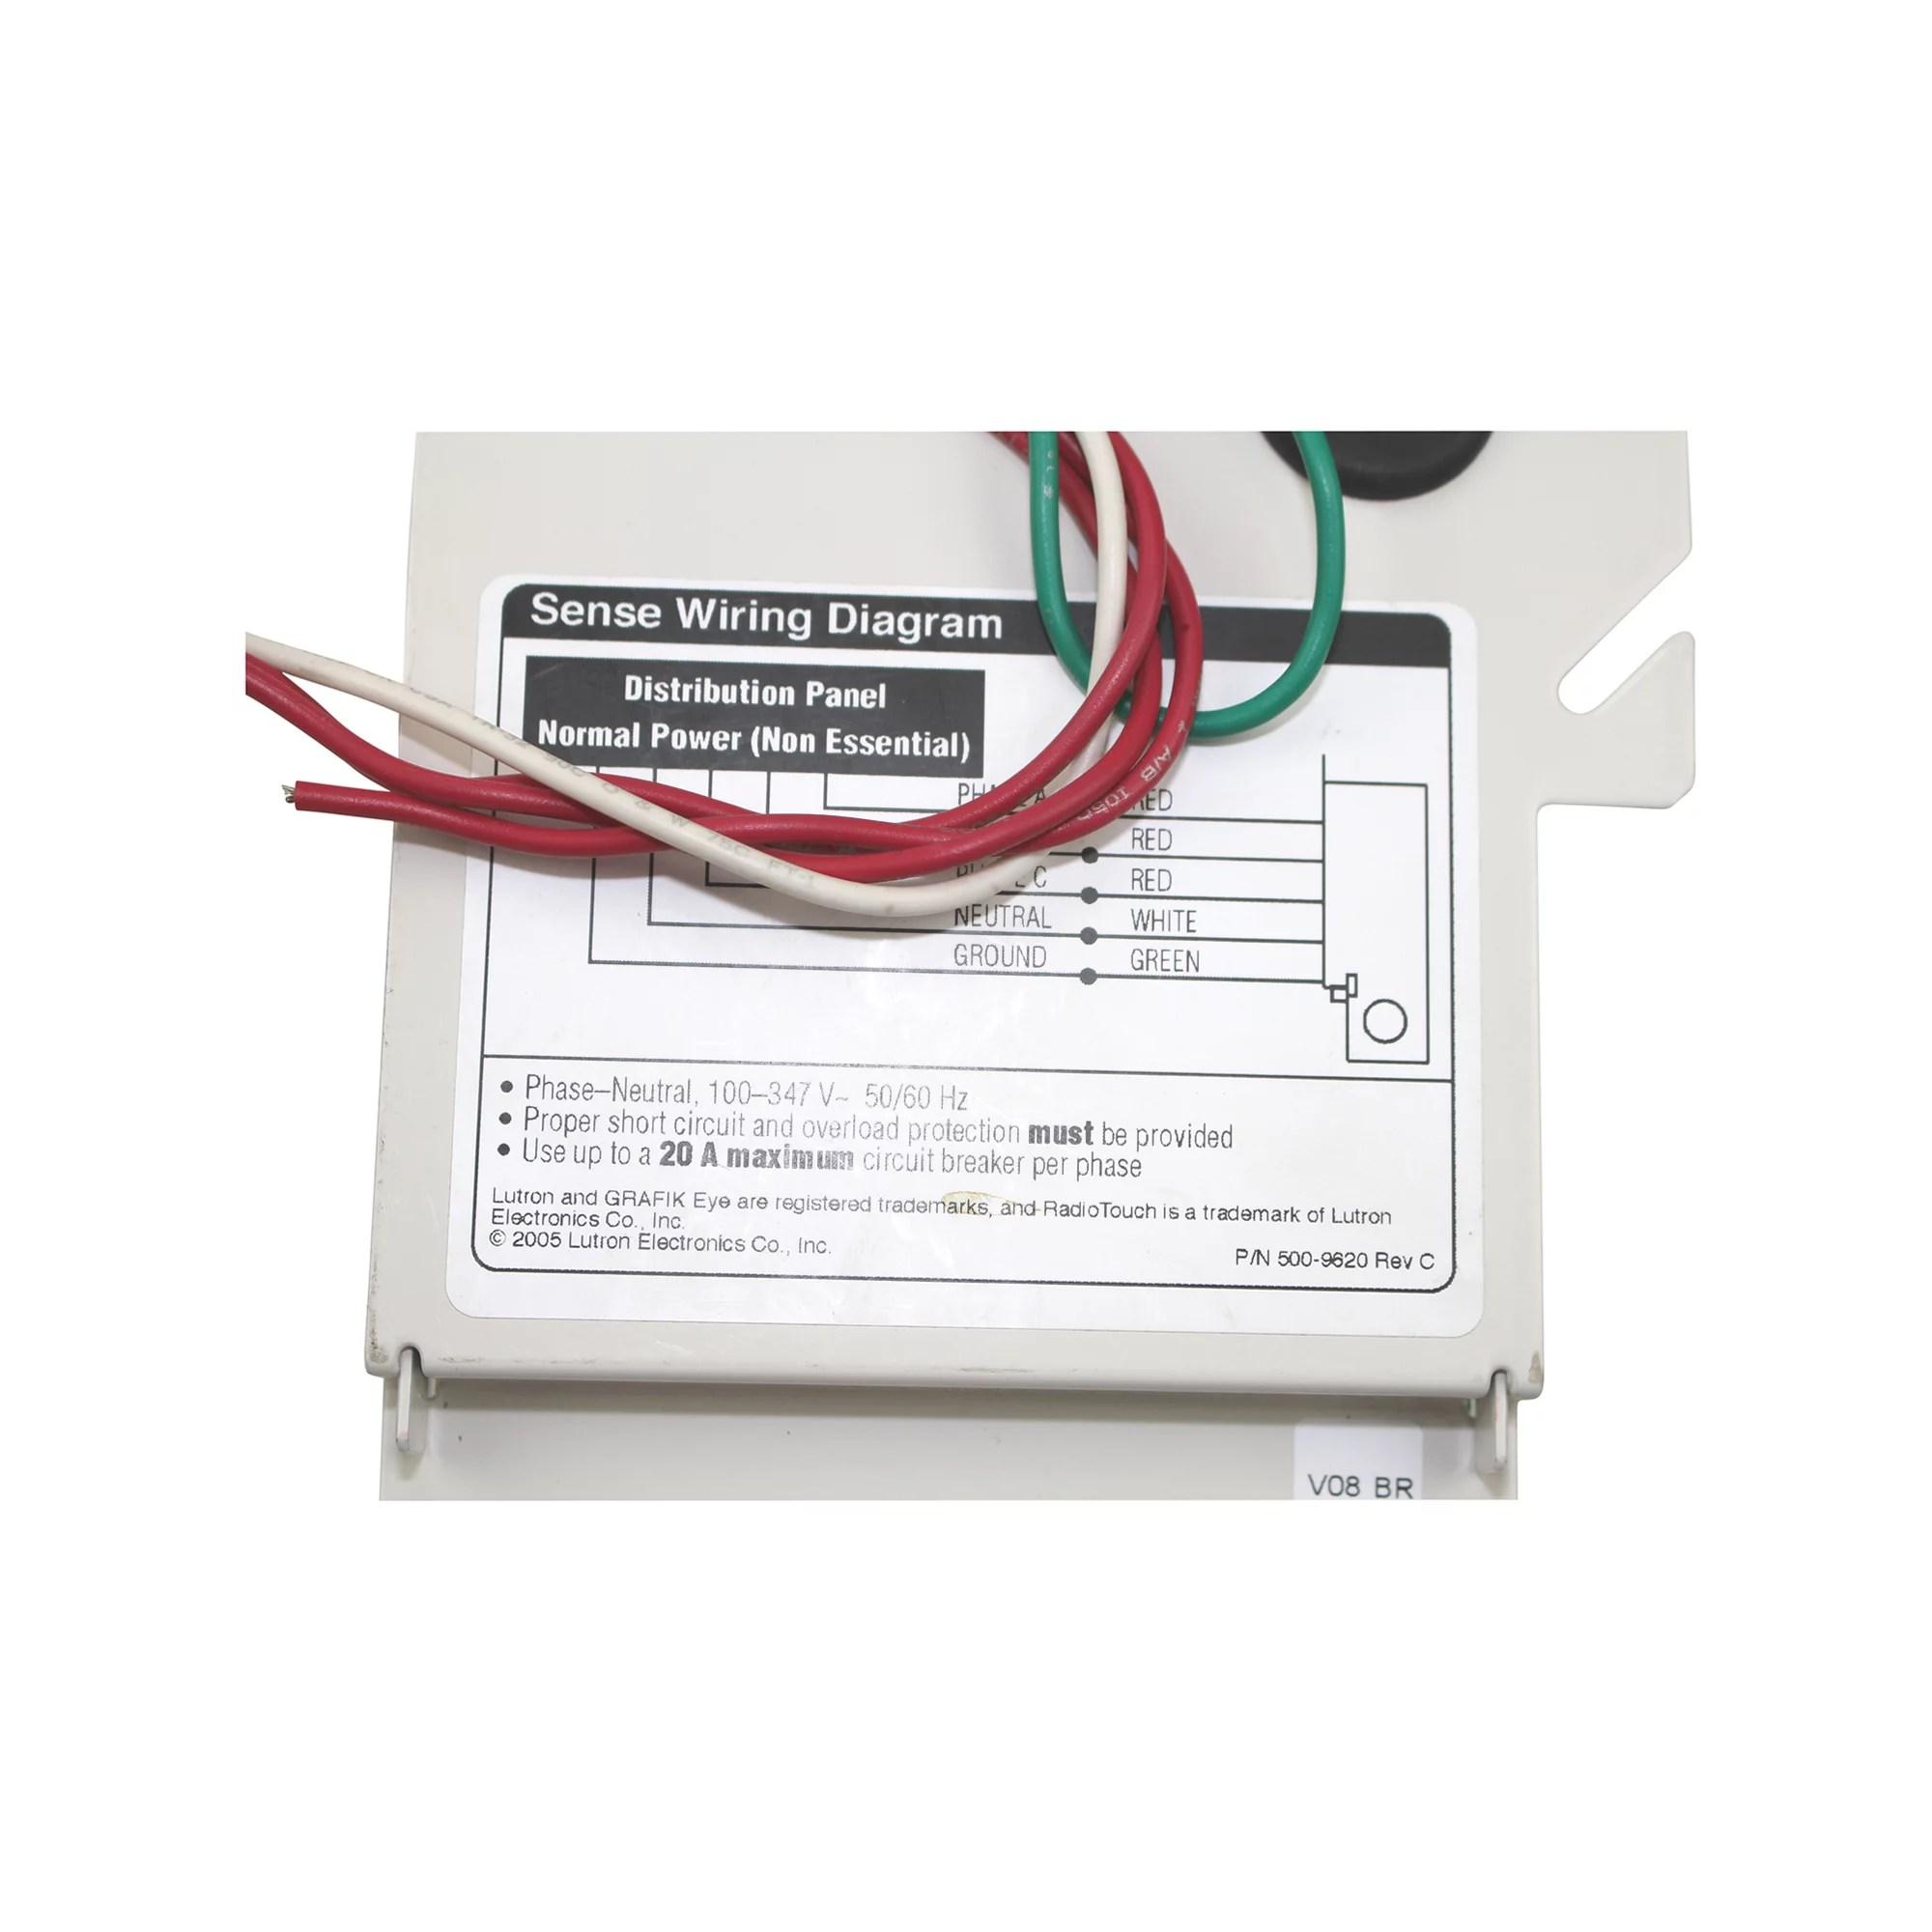 hight resolution of lutron grafik eye lut eli 3ph emergency lighting interface 3 phase detector 100v 347v 50 60hz walmart com